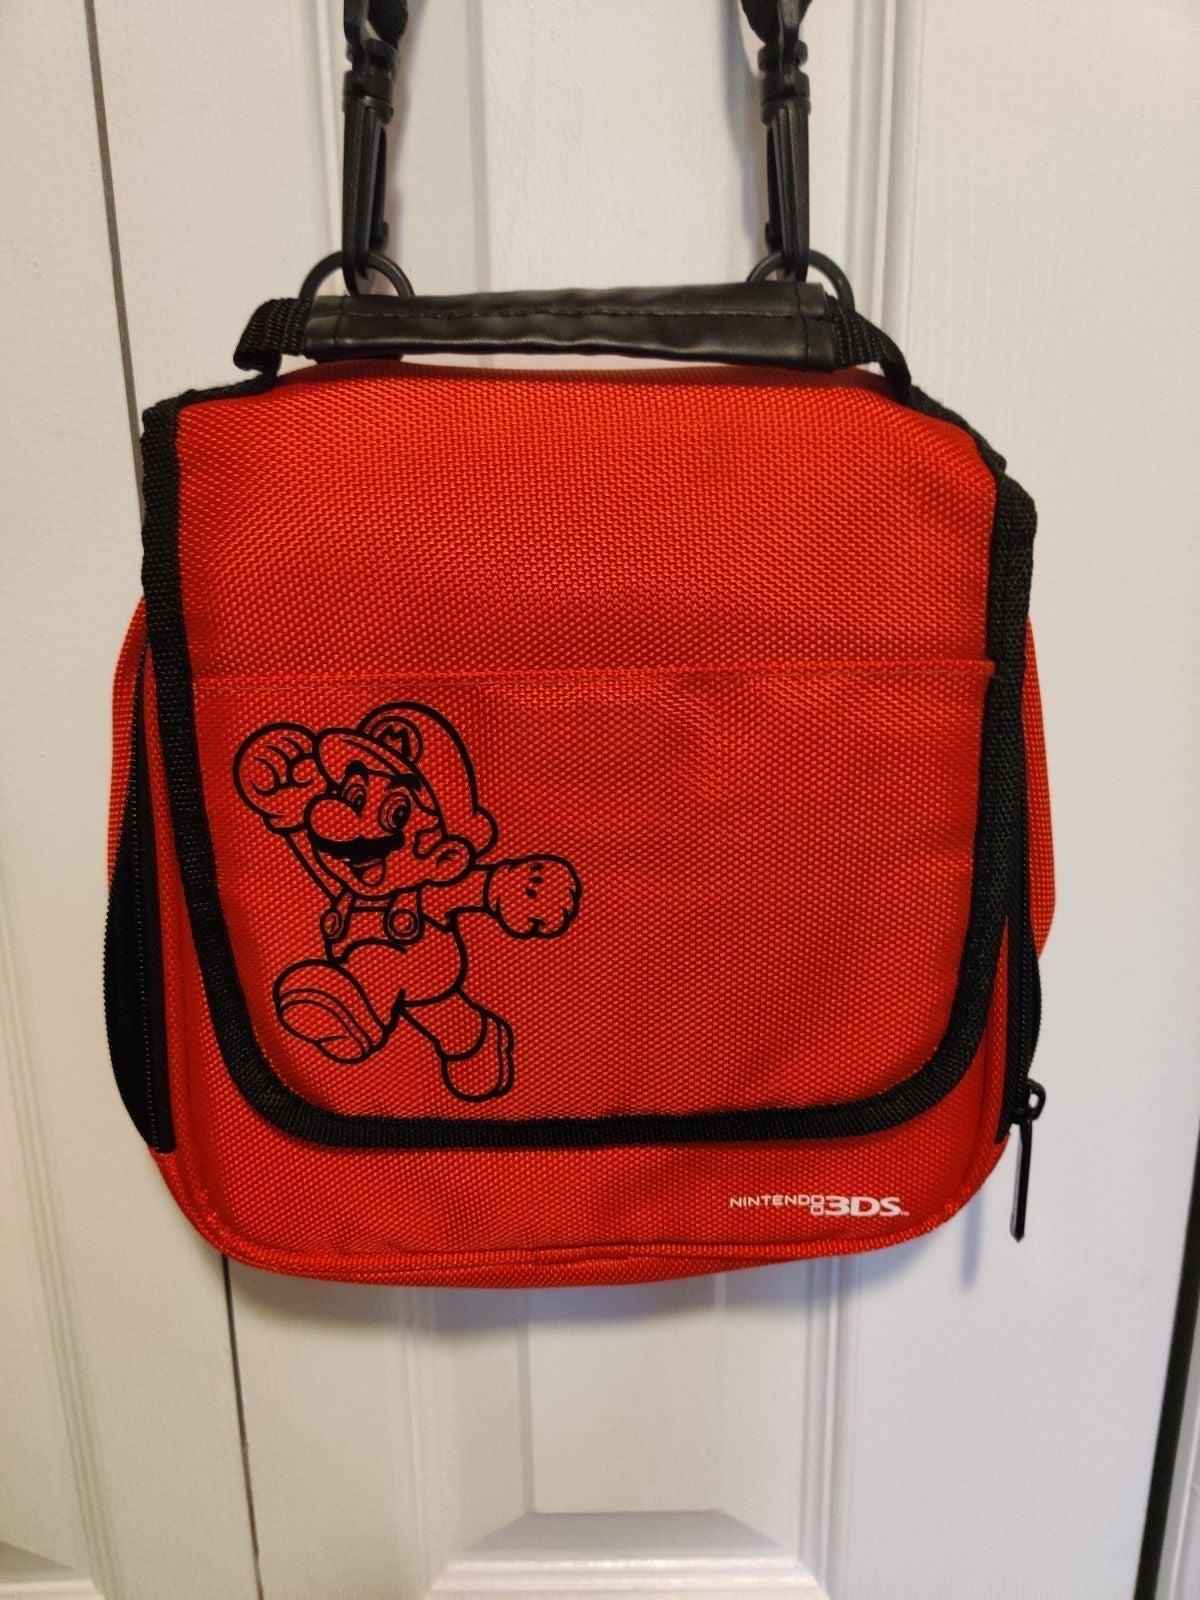 Mario Nintendo 3ds bag